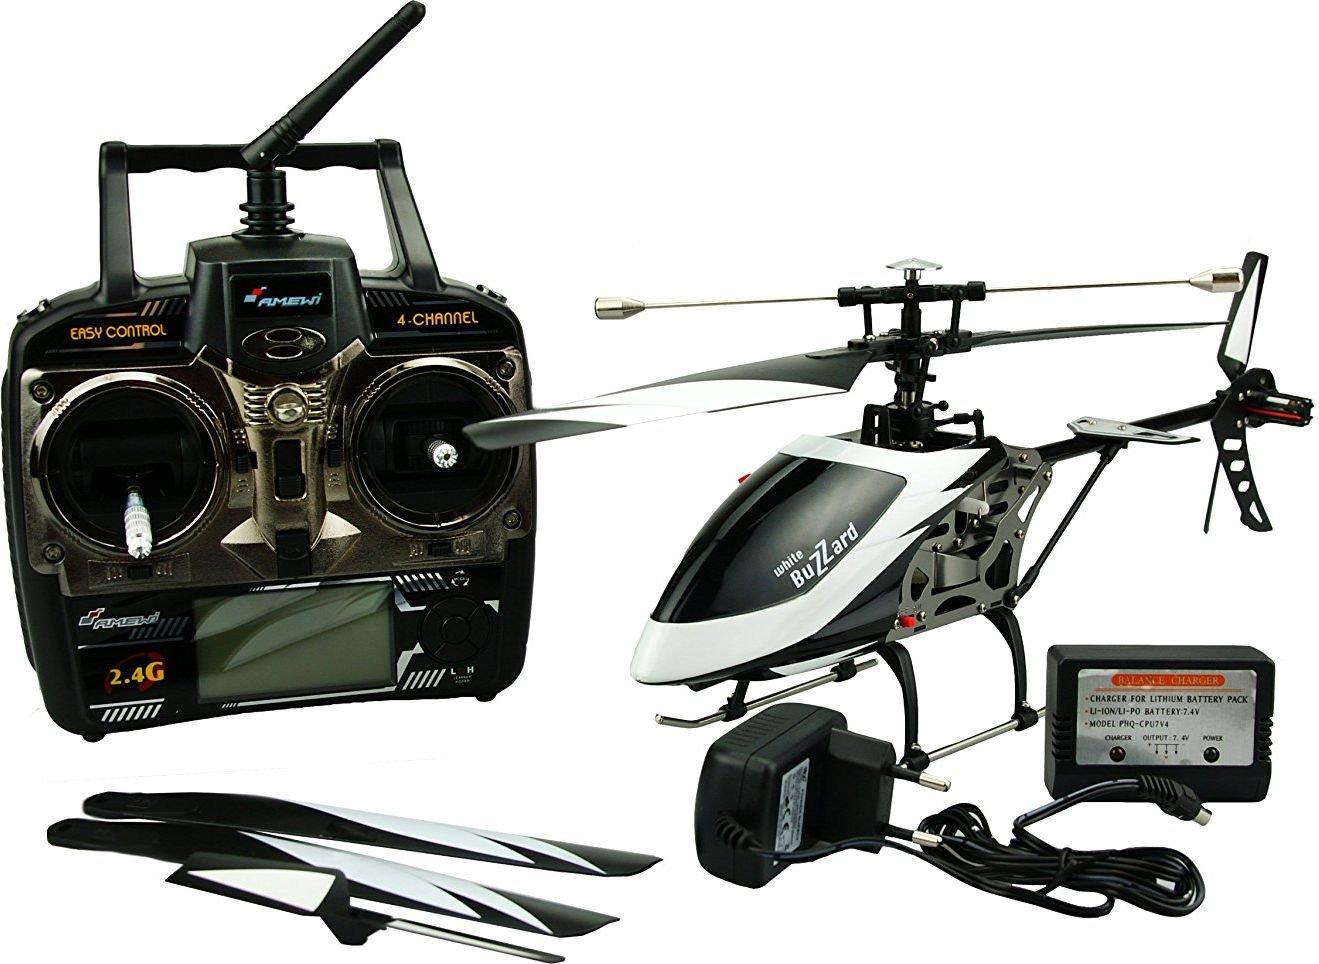 Helikopter RC z pilotem LCD (25137)